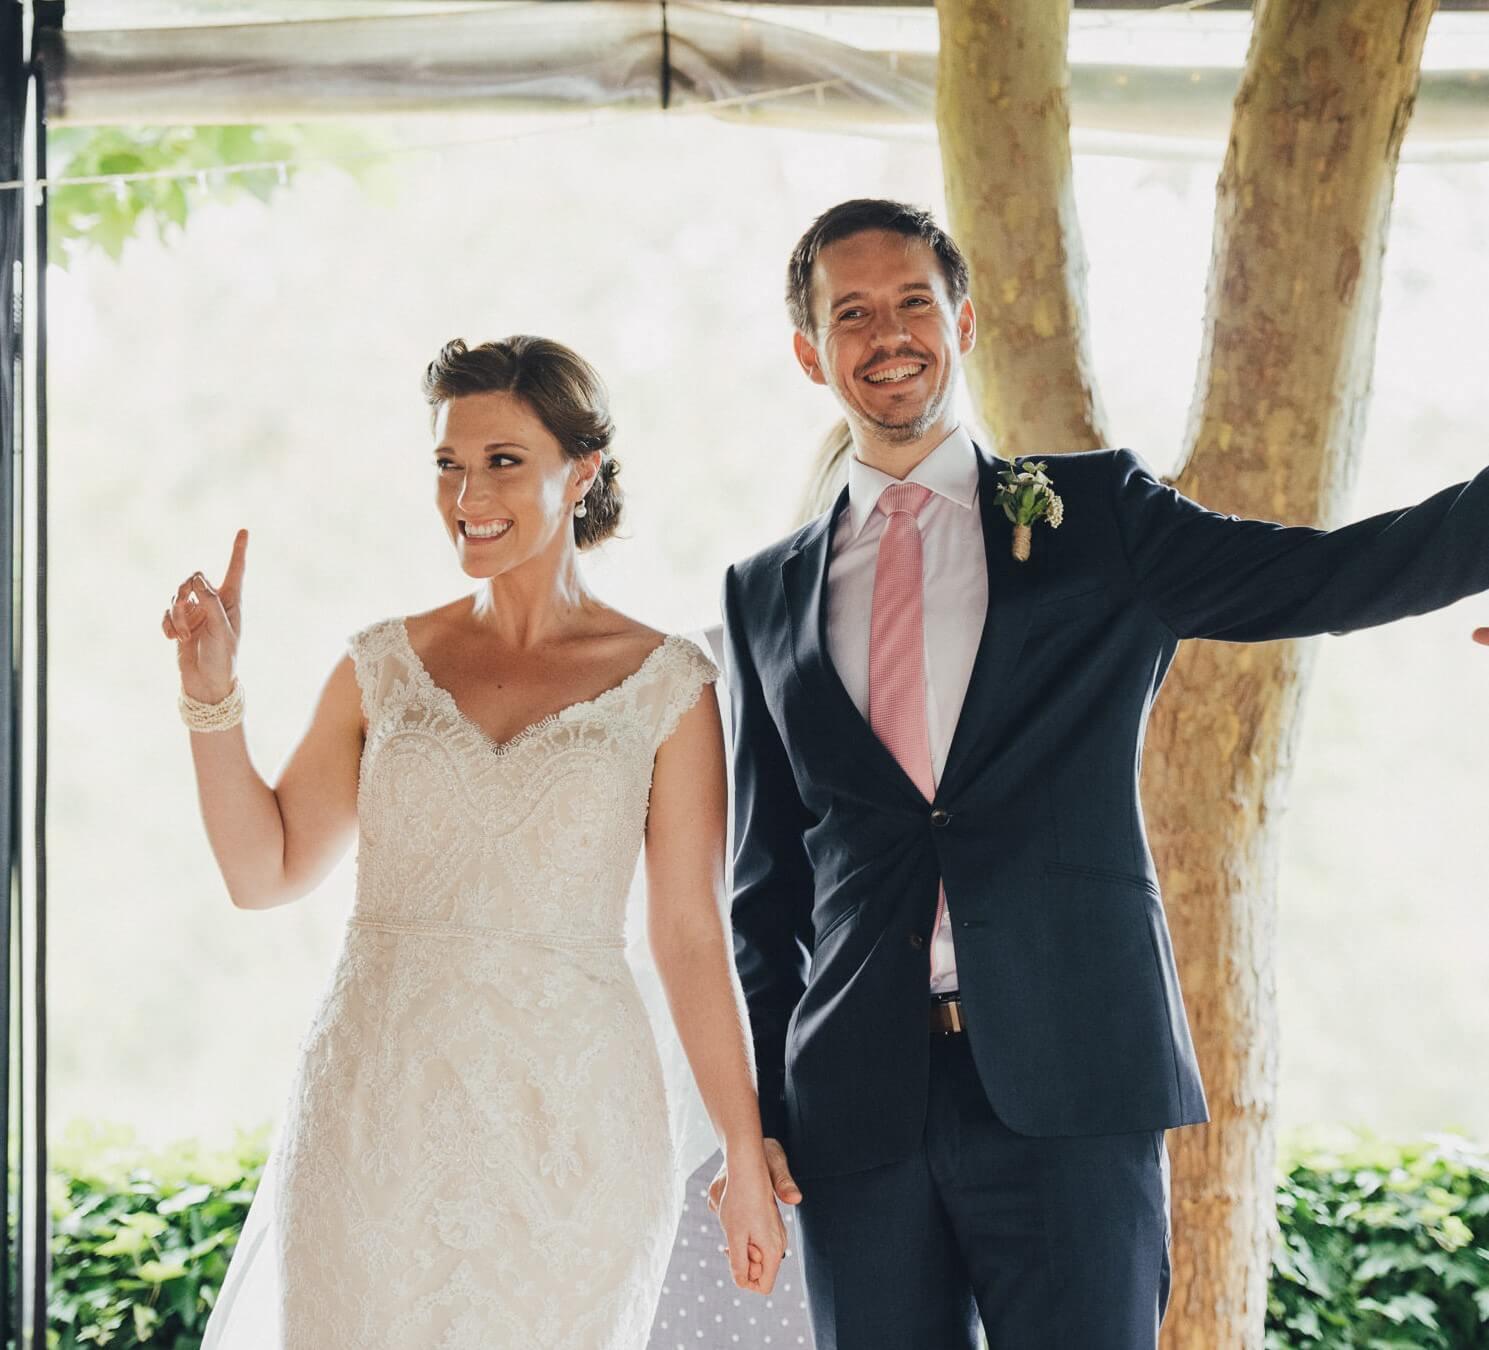 https://www.lovebirdceremonies.com.au/wp-content/uploads/2020/07/Frances-James.jpg